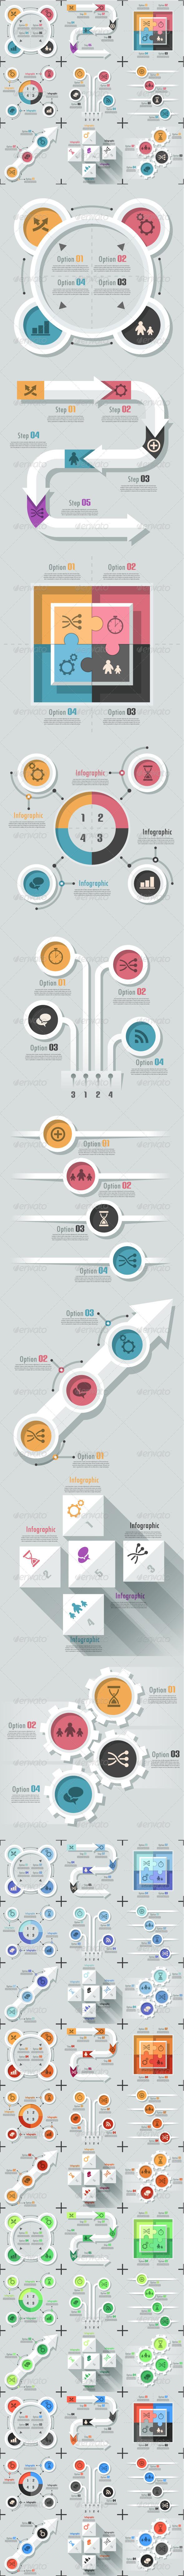 9-flat-infographic